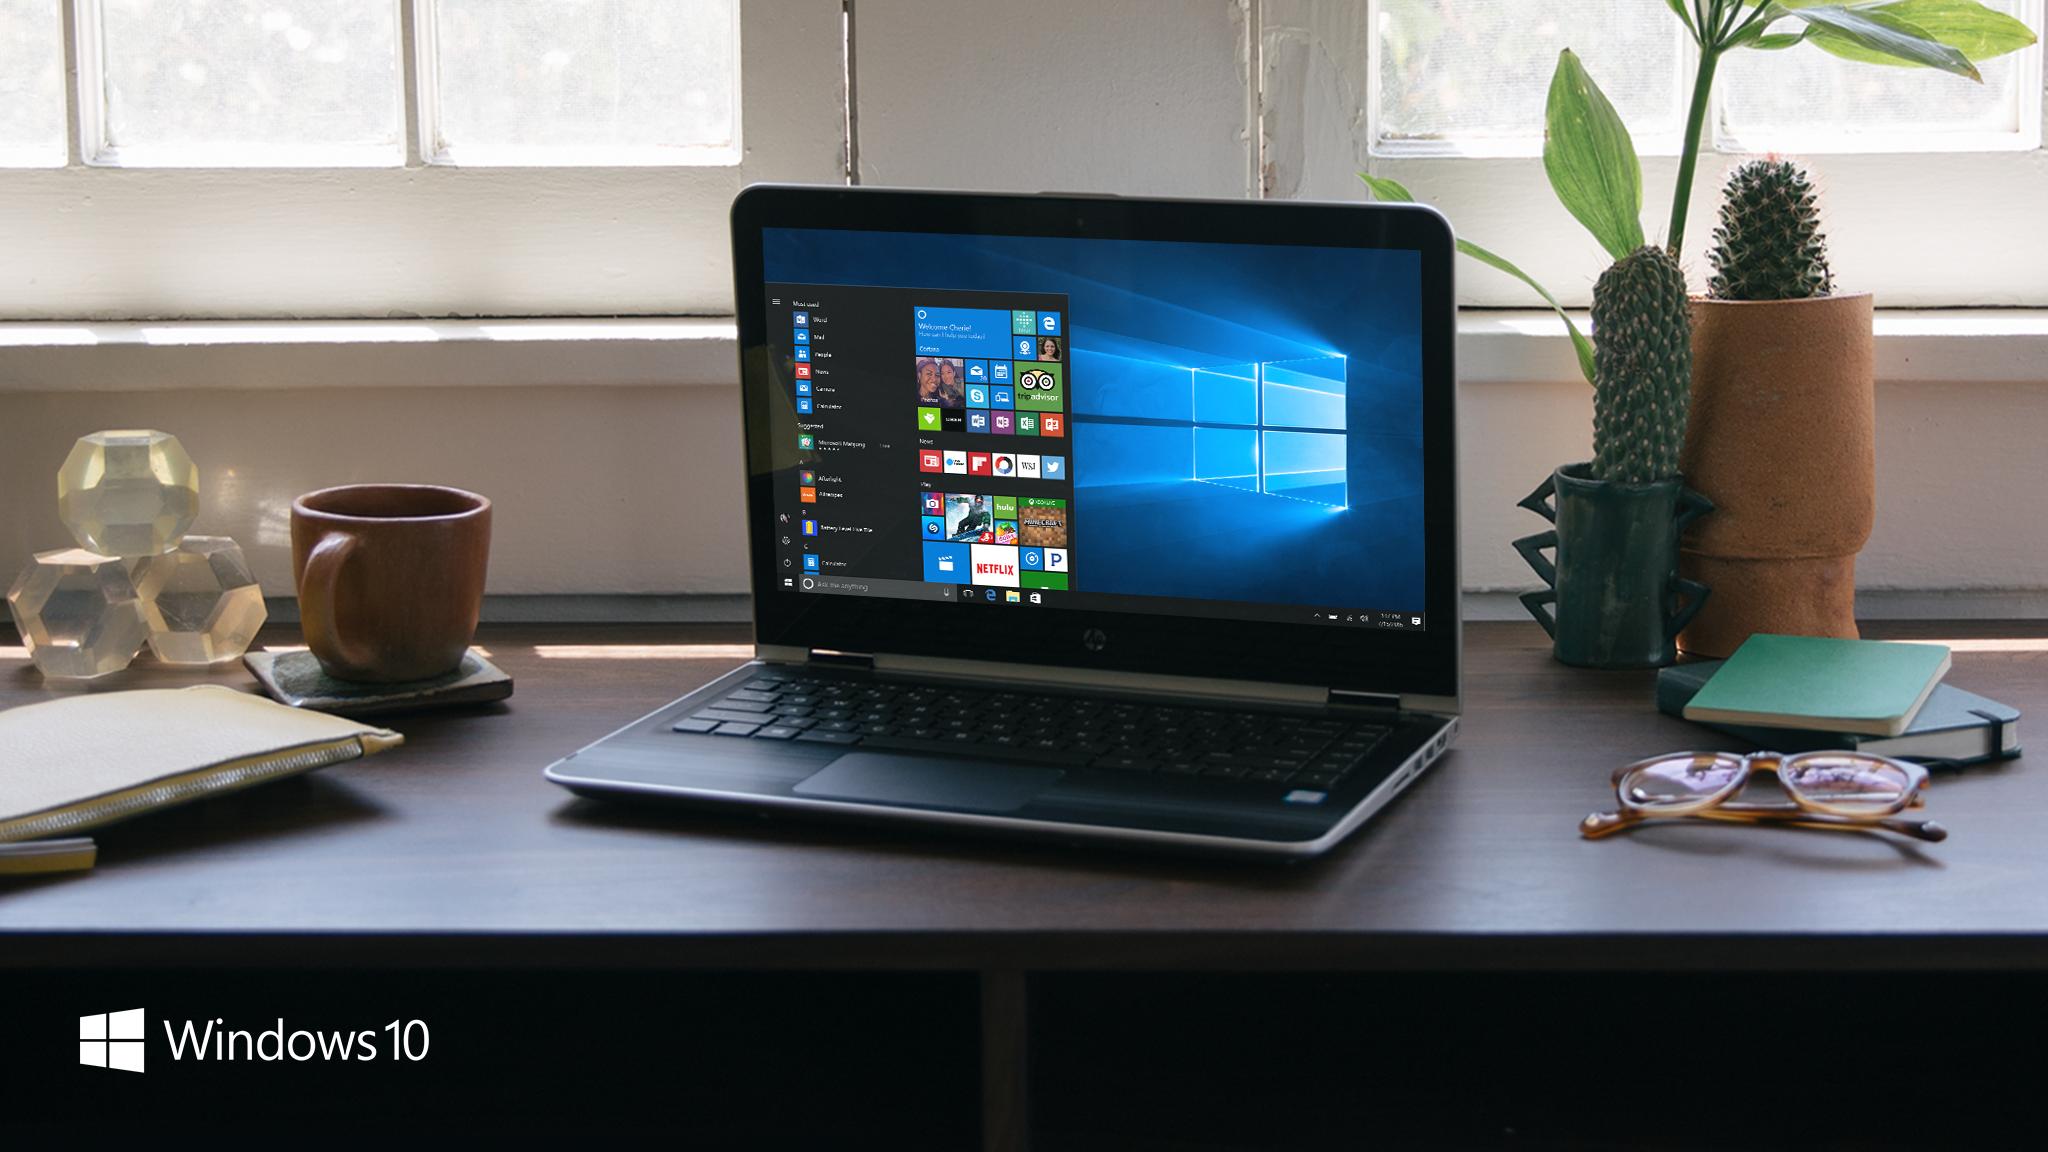 Windows 10 - Microsoft Store - Windows 2017-10-19 14:30